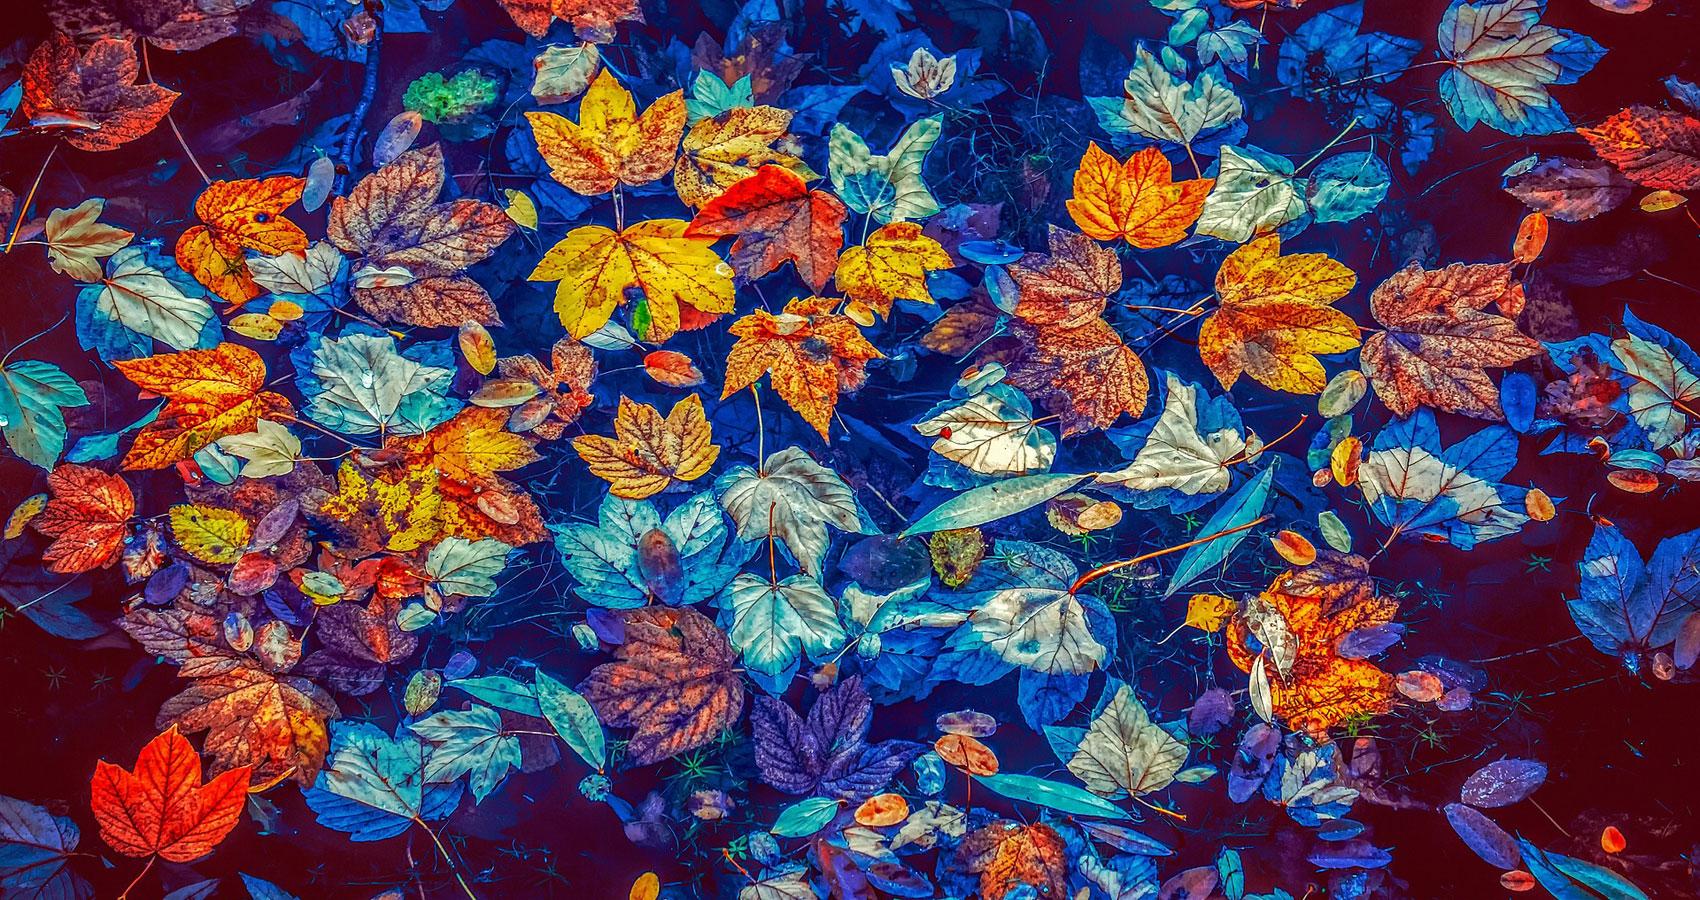 To Autumn, a poem written by John Keats at Spillwords.com